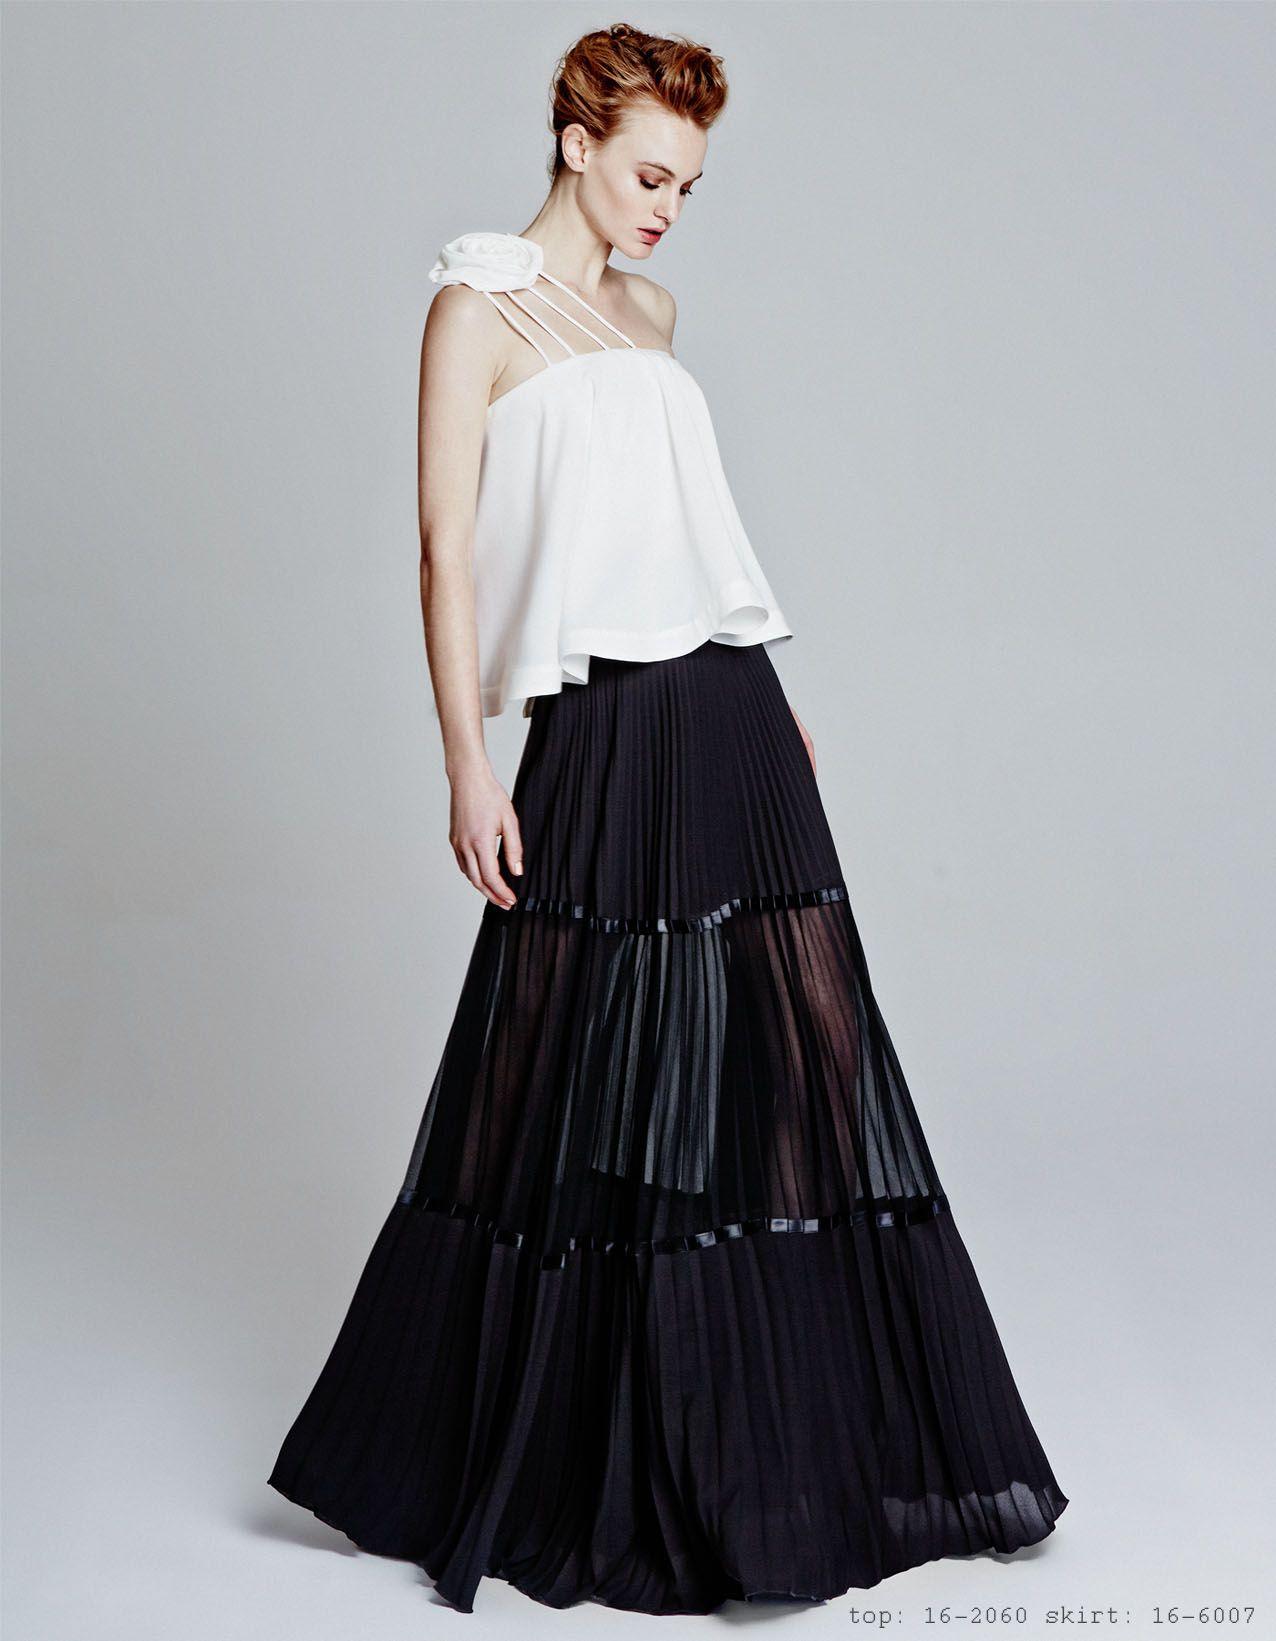 Long Plisse Skirt White Top With Flower Jeunes Chics Crateurs